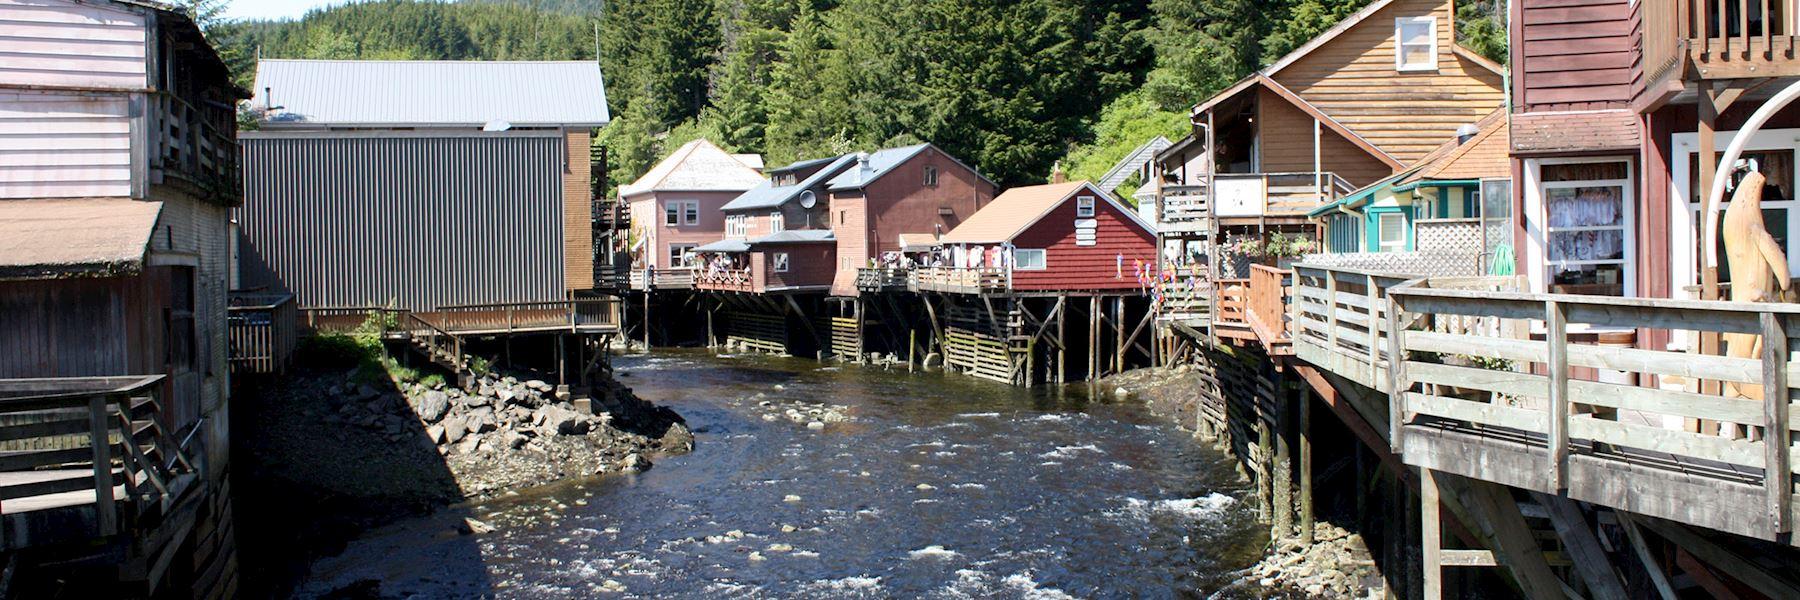 Visit Ketchikan, Alaska